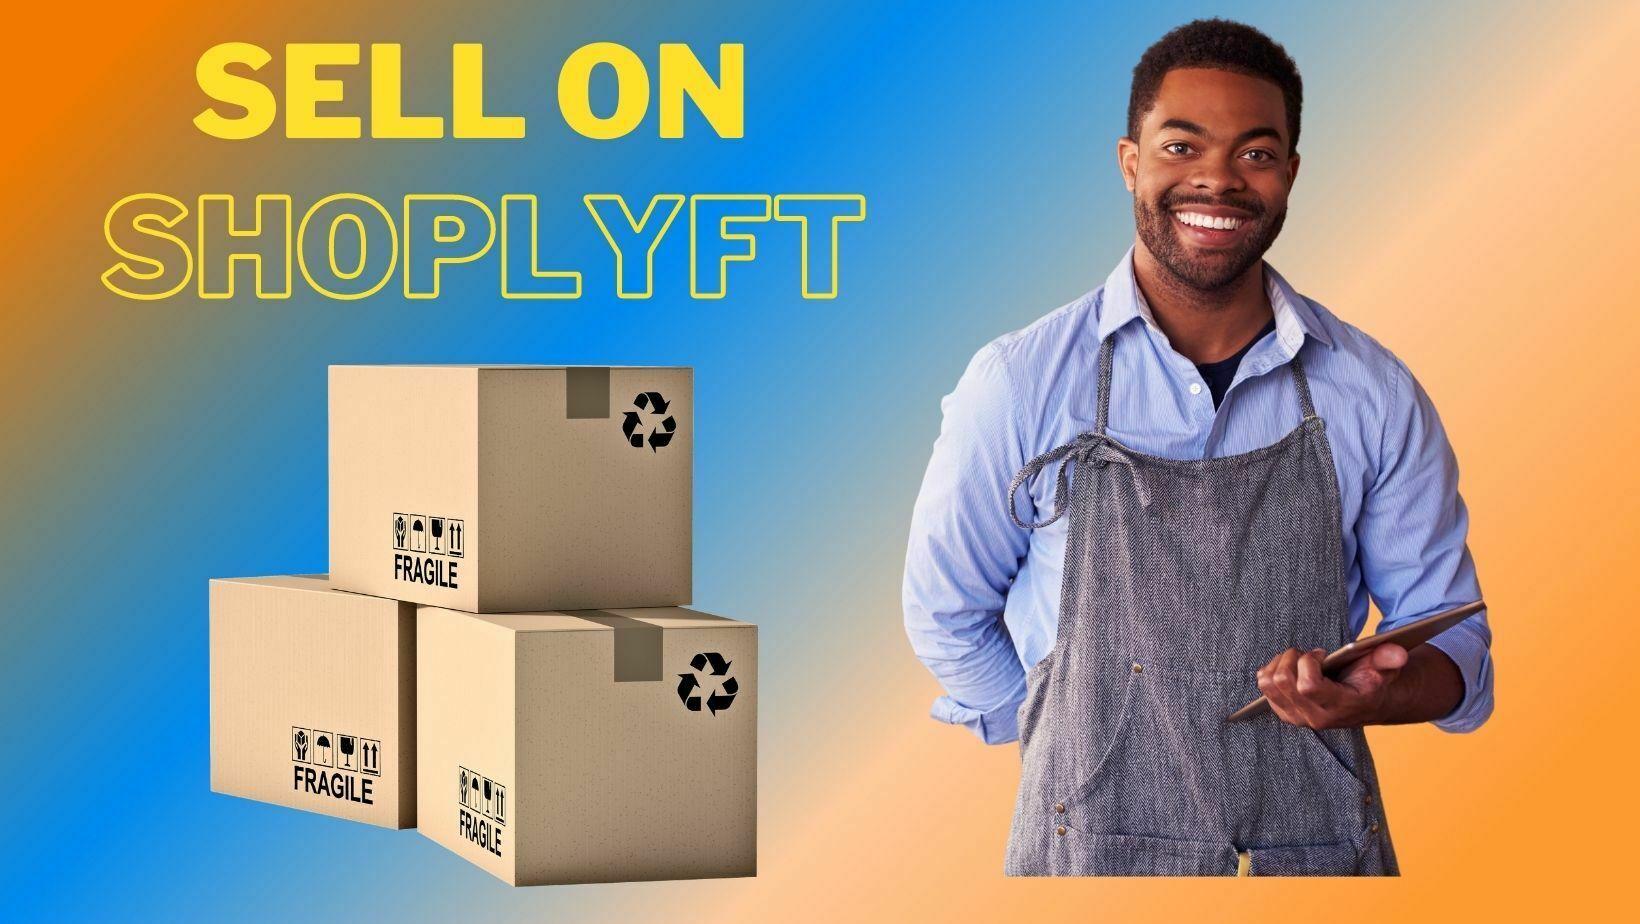 Sell On Shoplyft